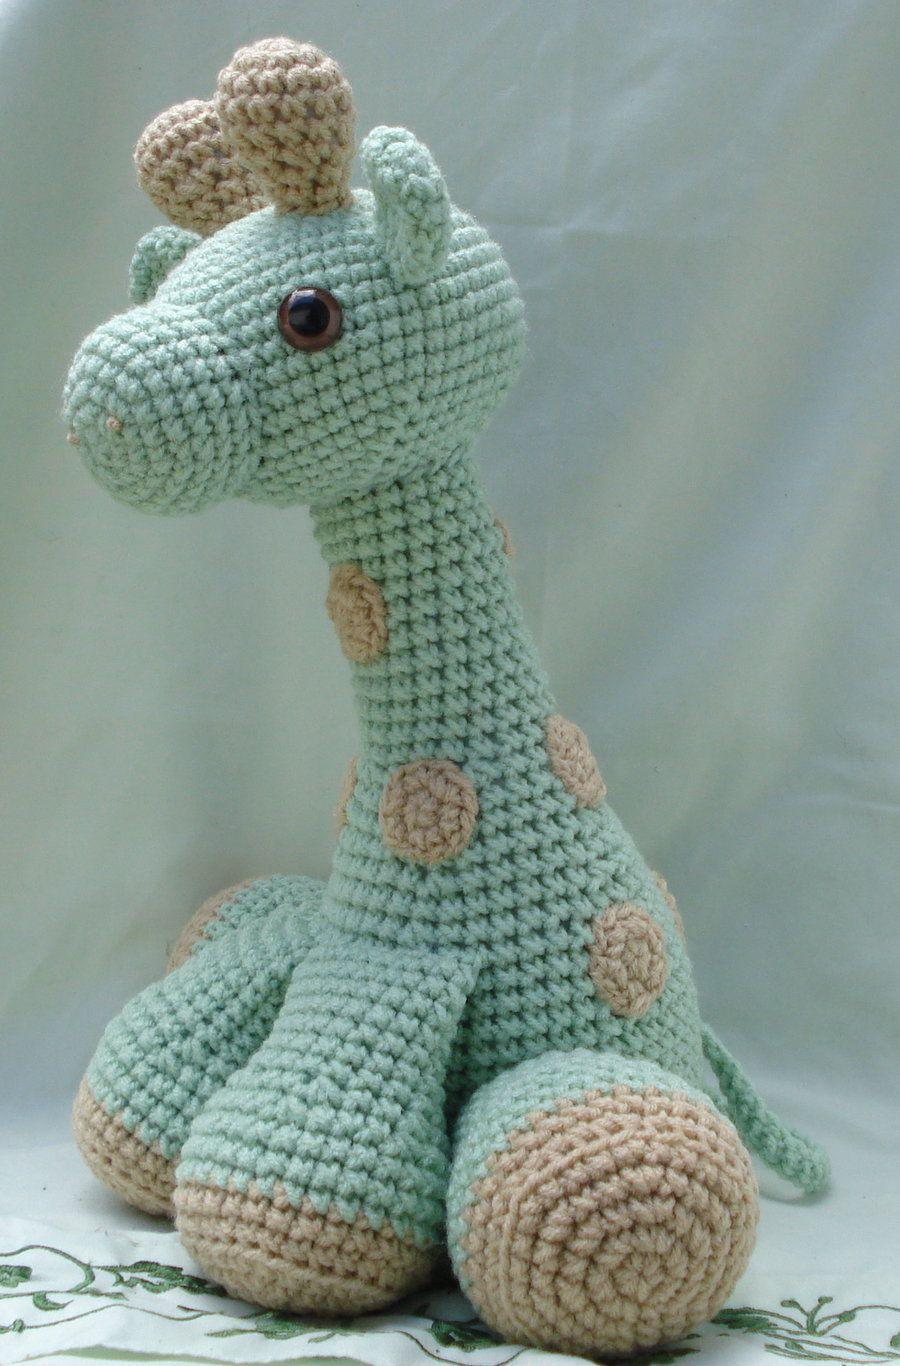 Amigurumi Giraffe Free Crochet Pattern (With images) | Crochet ... | 1366x900